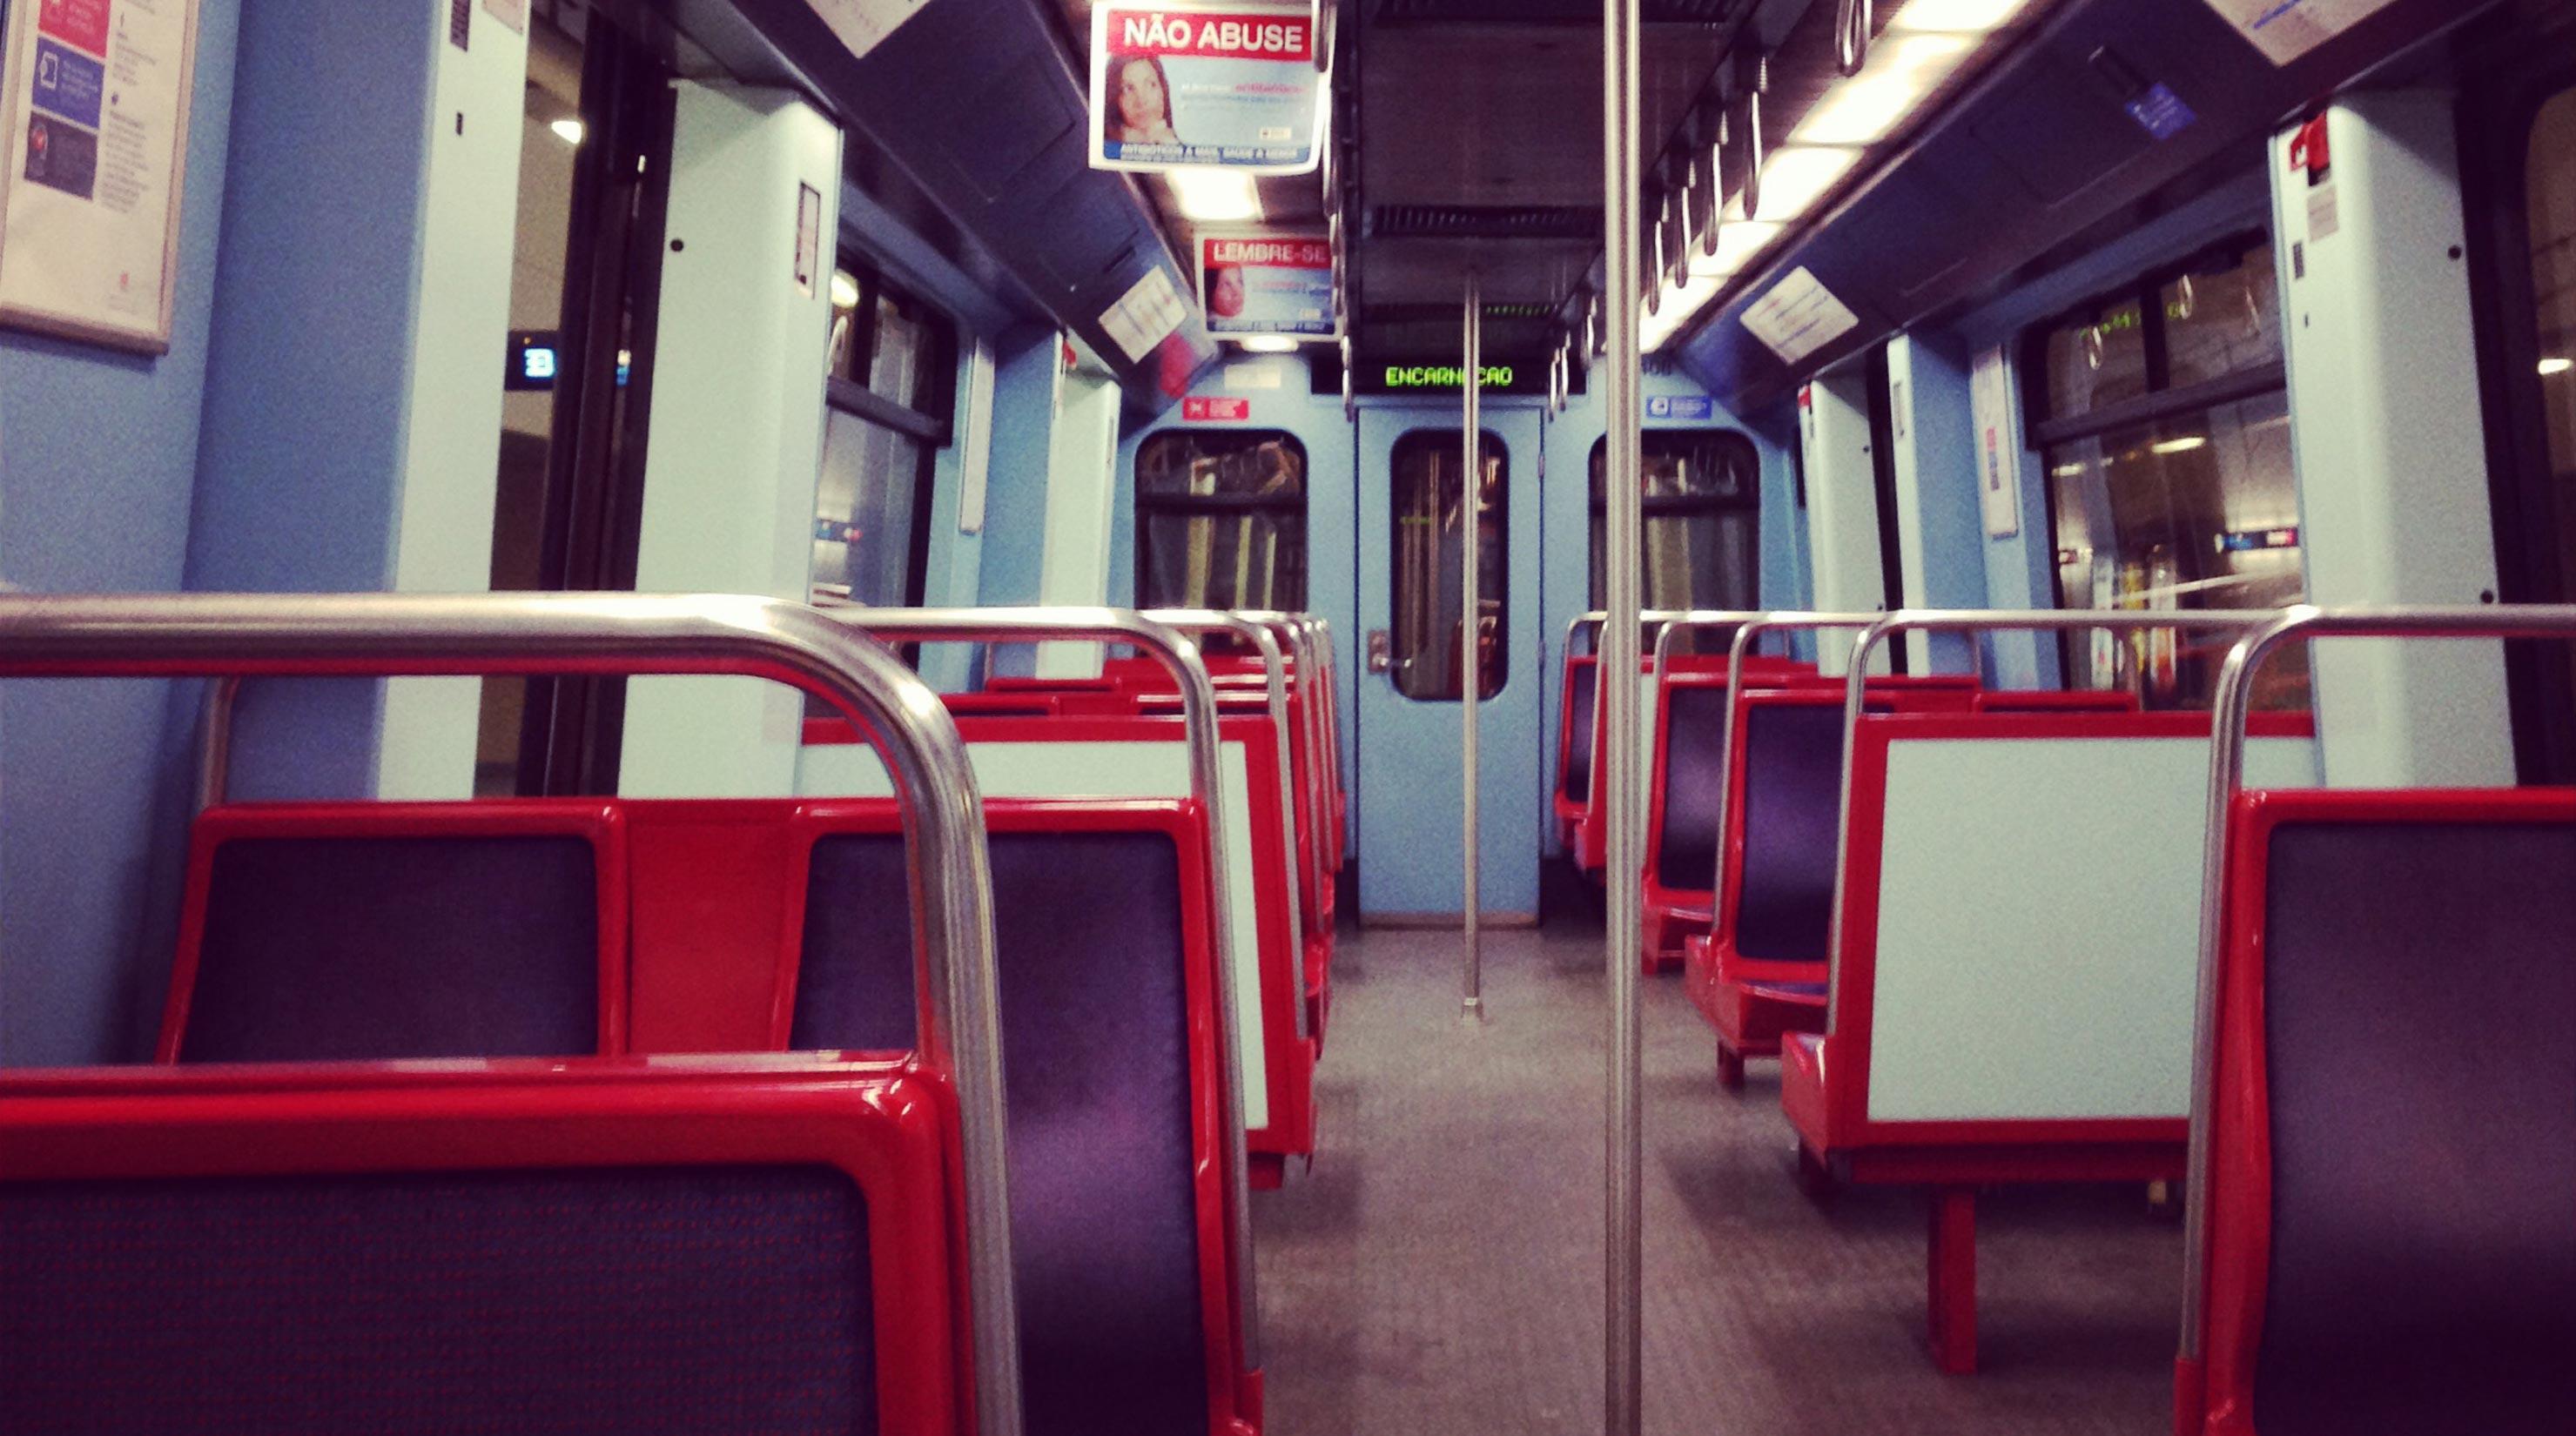 Вагон метро в Лиссабоне. Subway train Lisbon